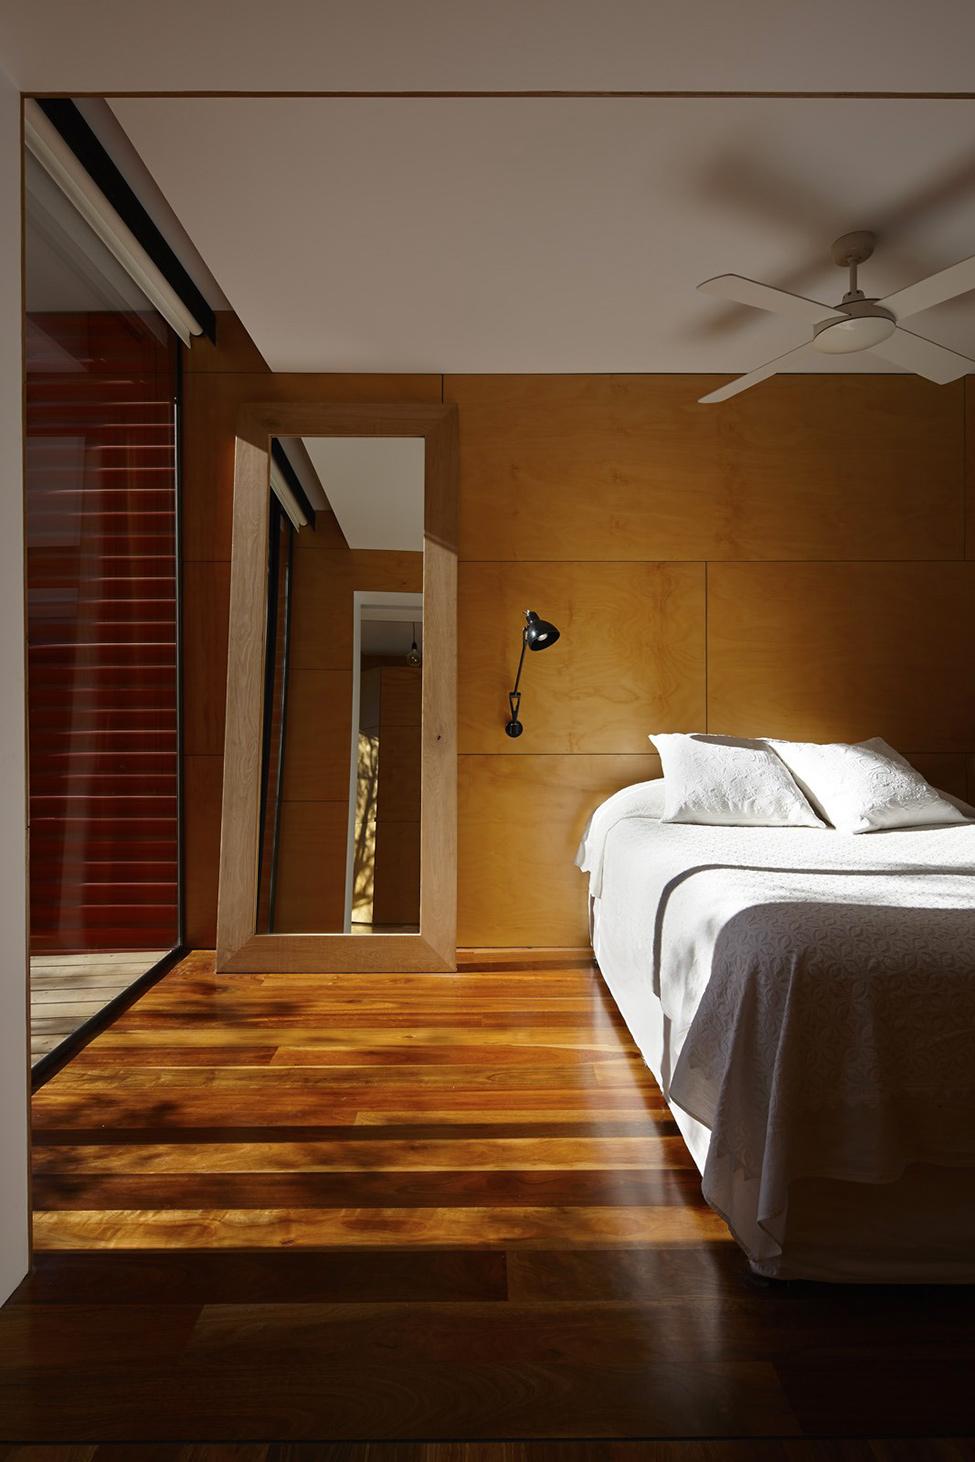 renovate classic to modern townhome australia (7)